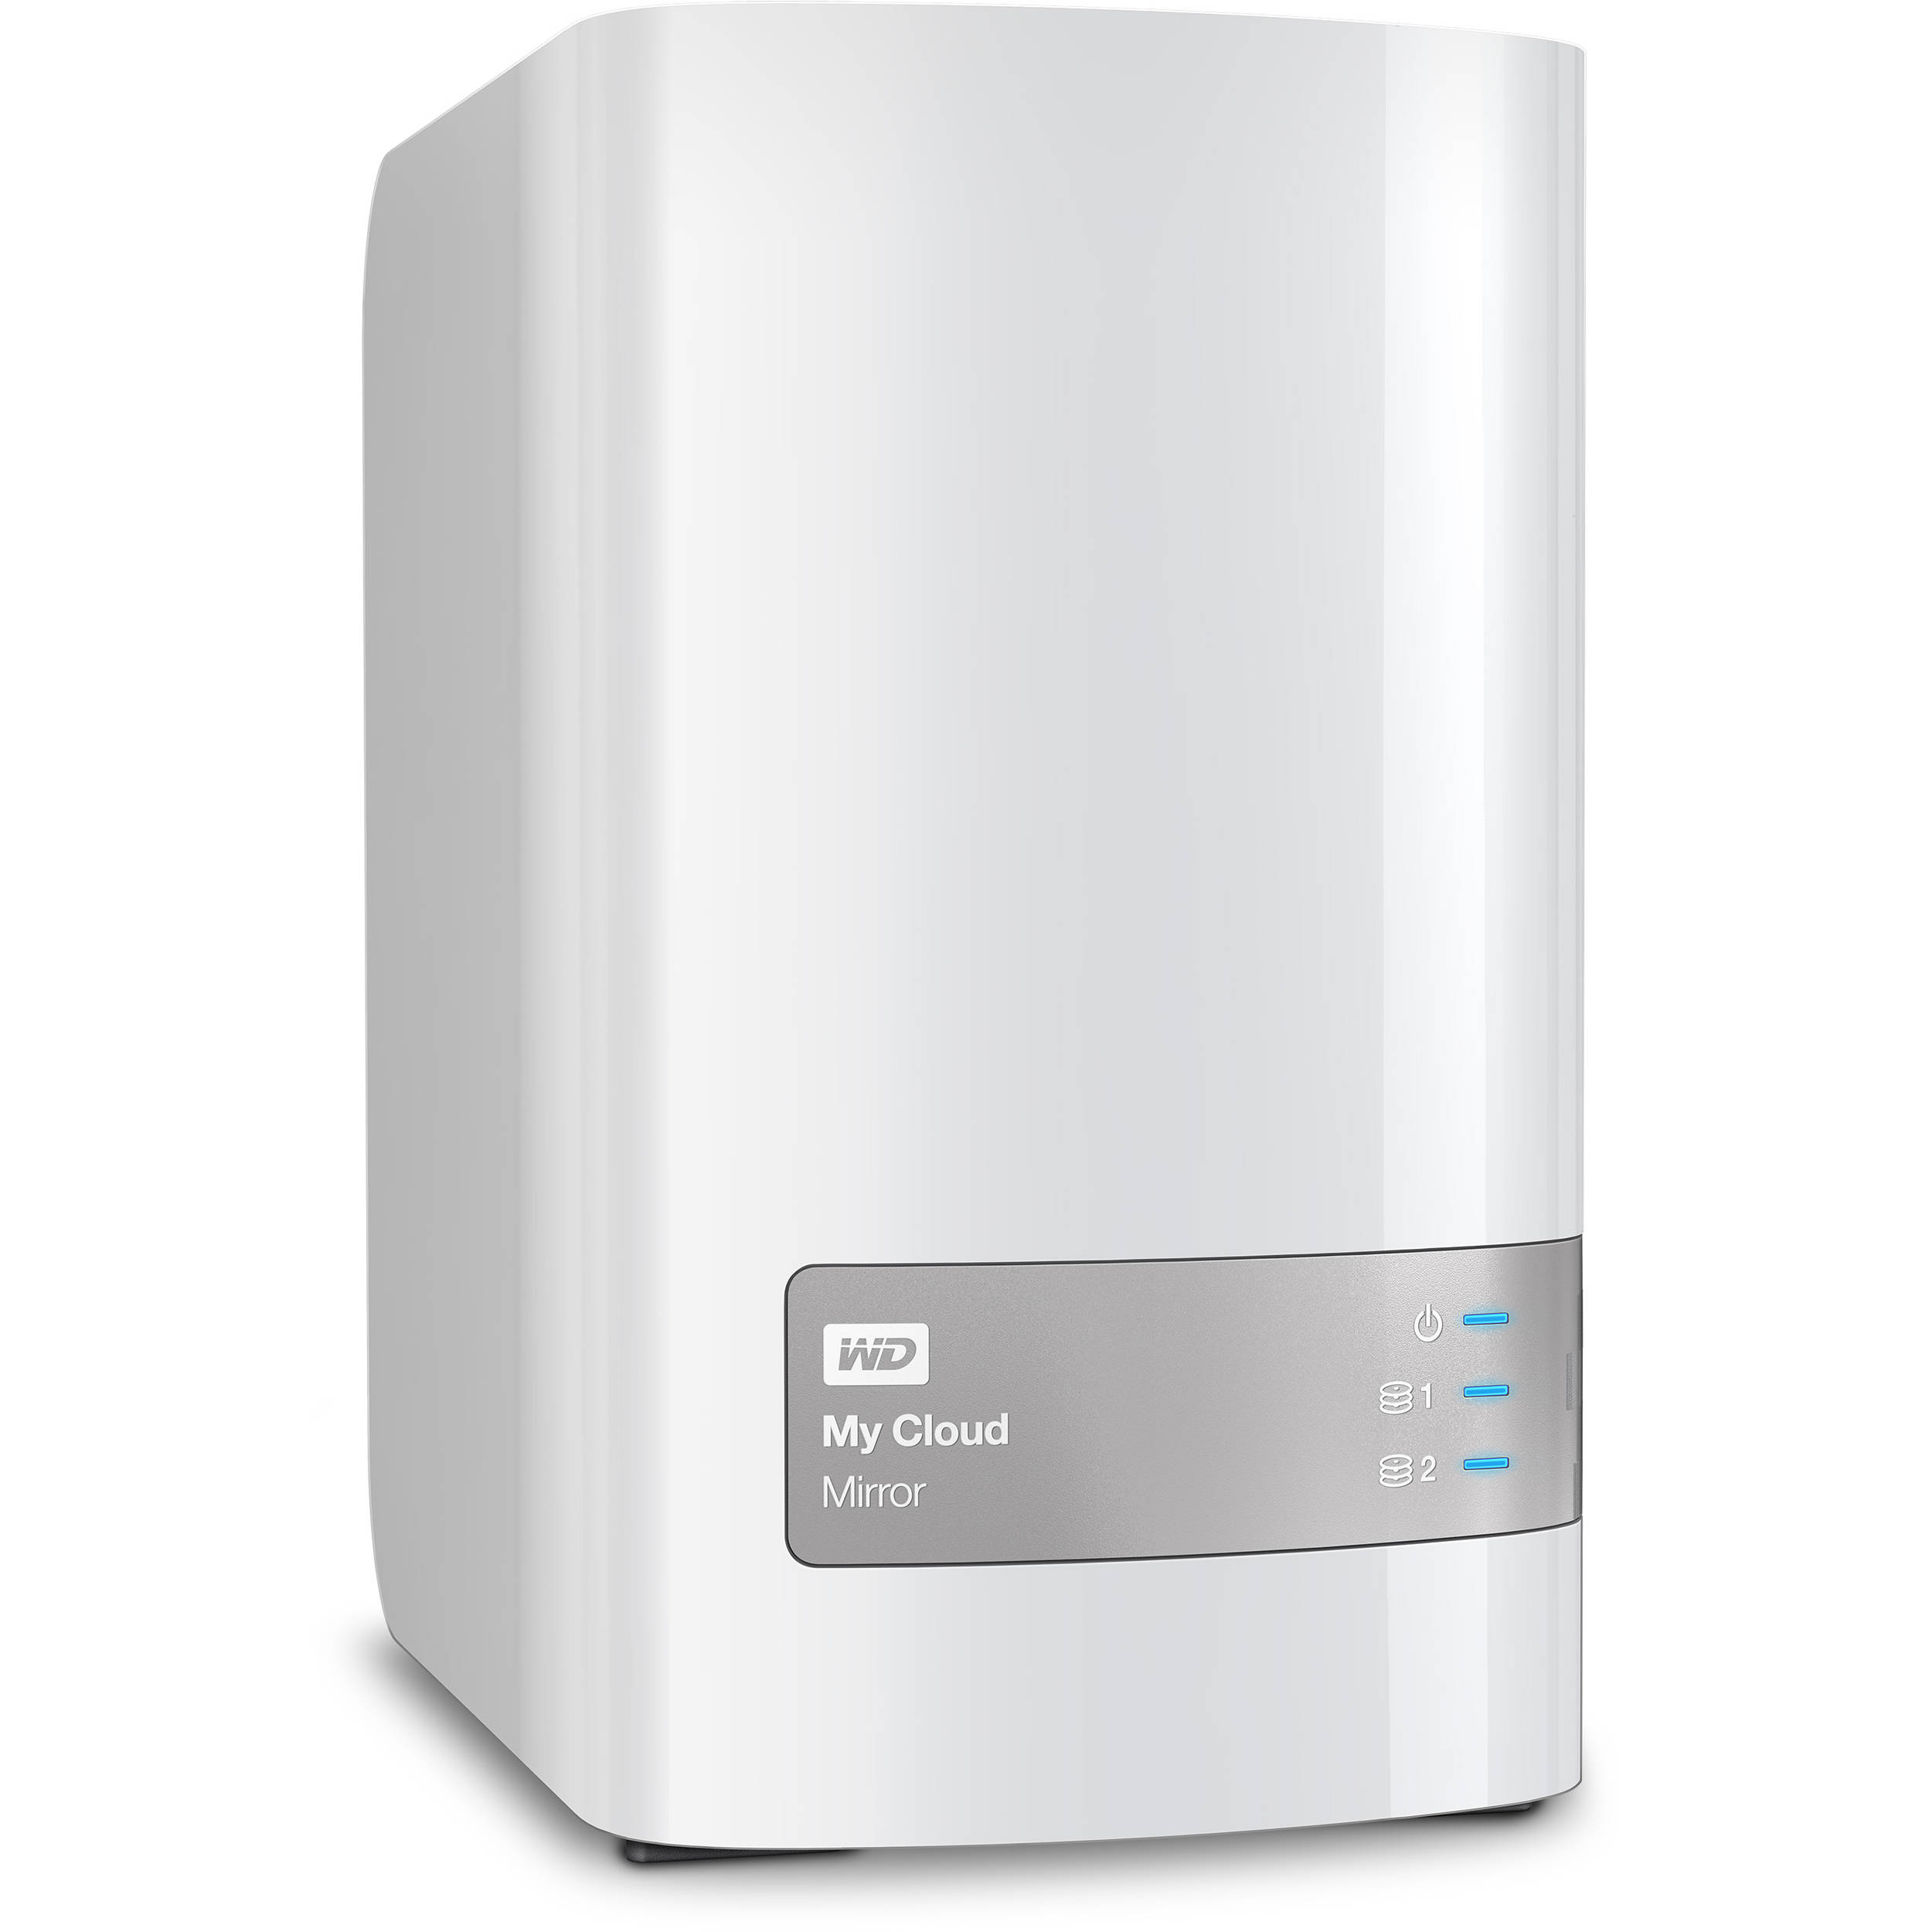 WD My Cloud Mirror (Gen 2) 8TB 2-Bay NAS Server (2 x 4TB)